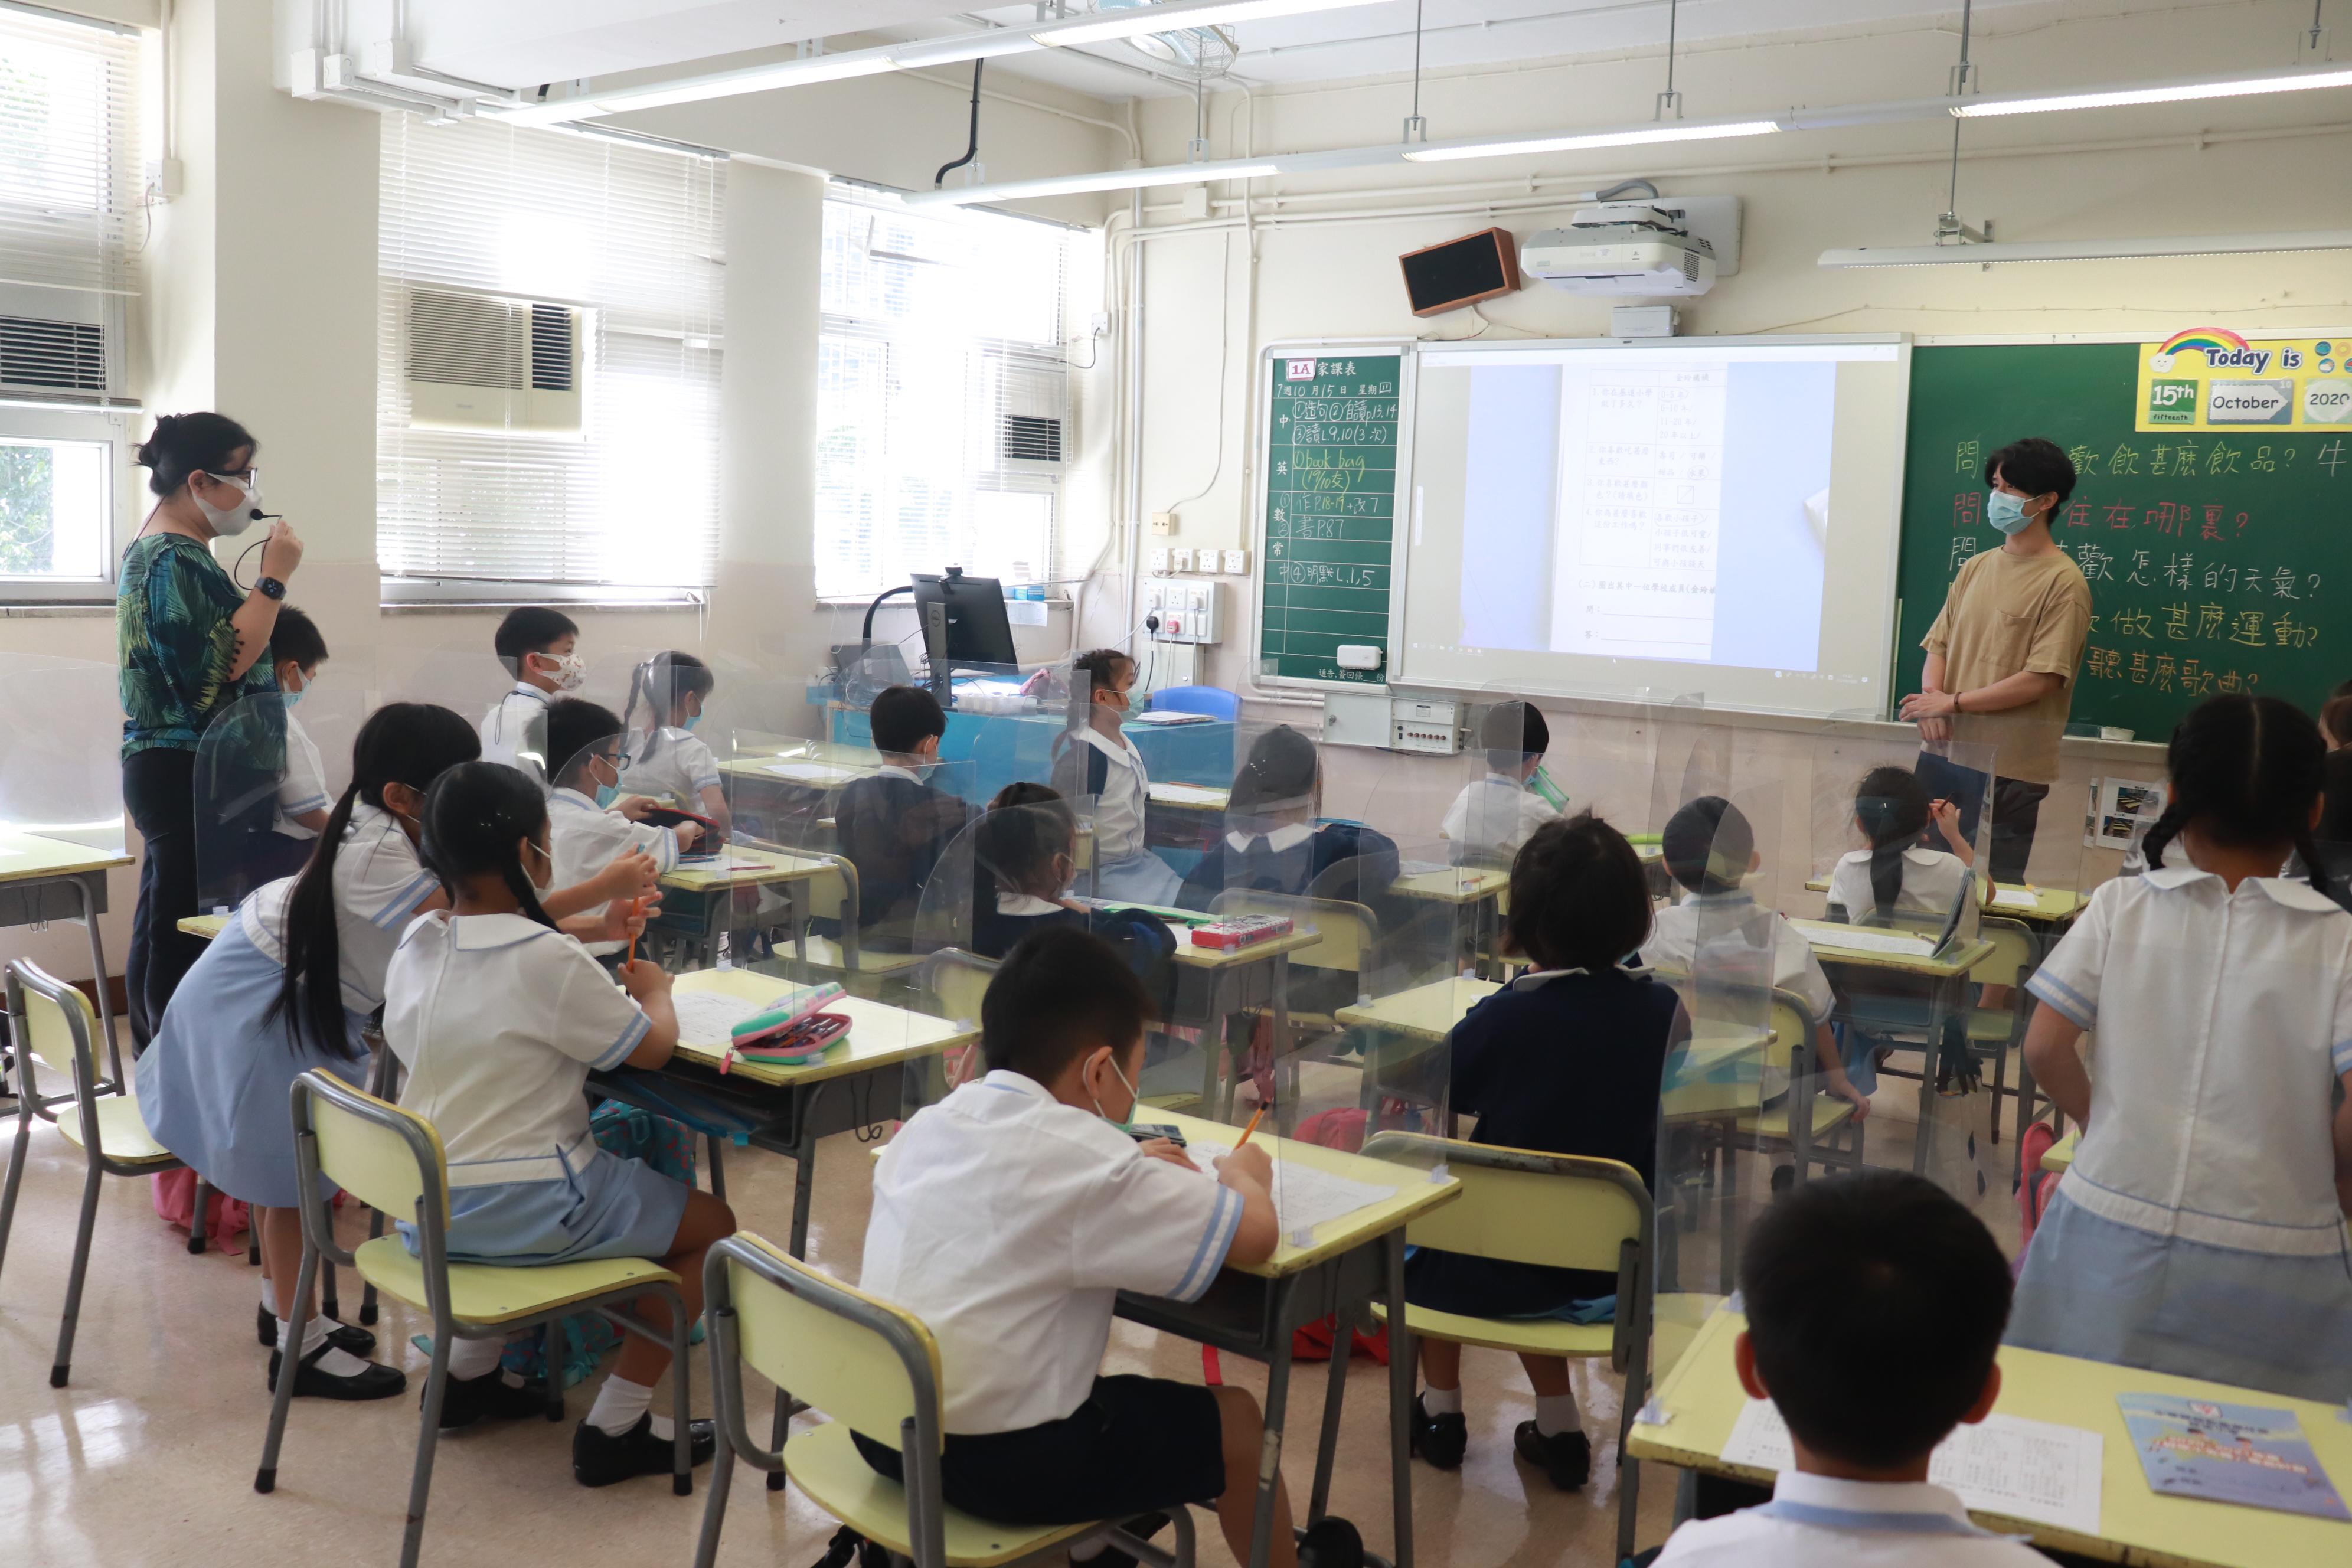 http://keito.school.hk/sites/default/files/img_6536.jpg